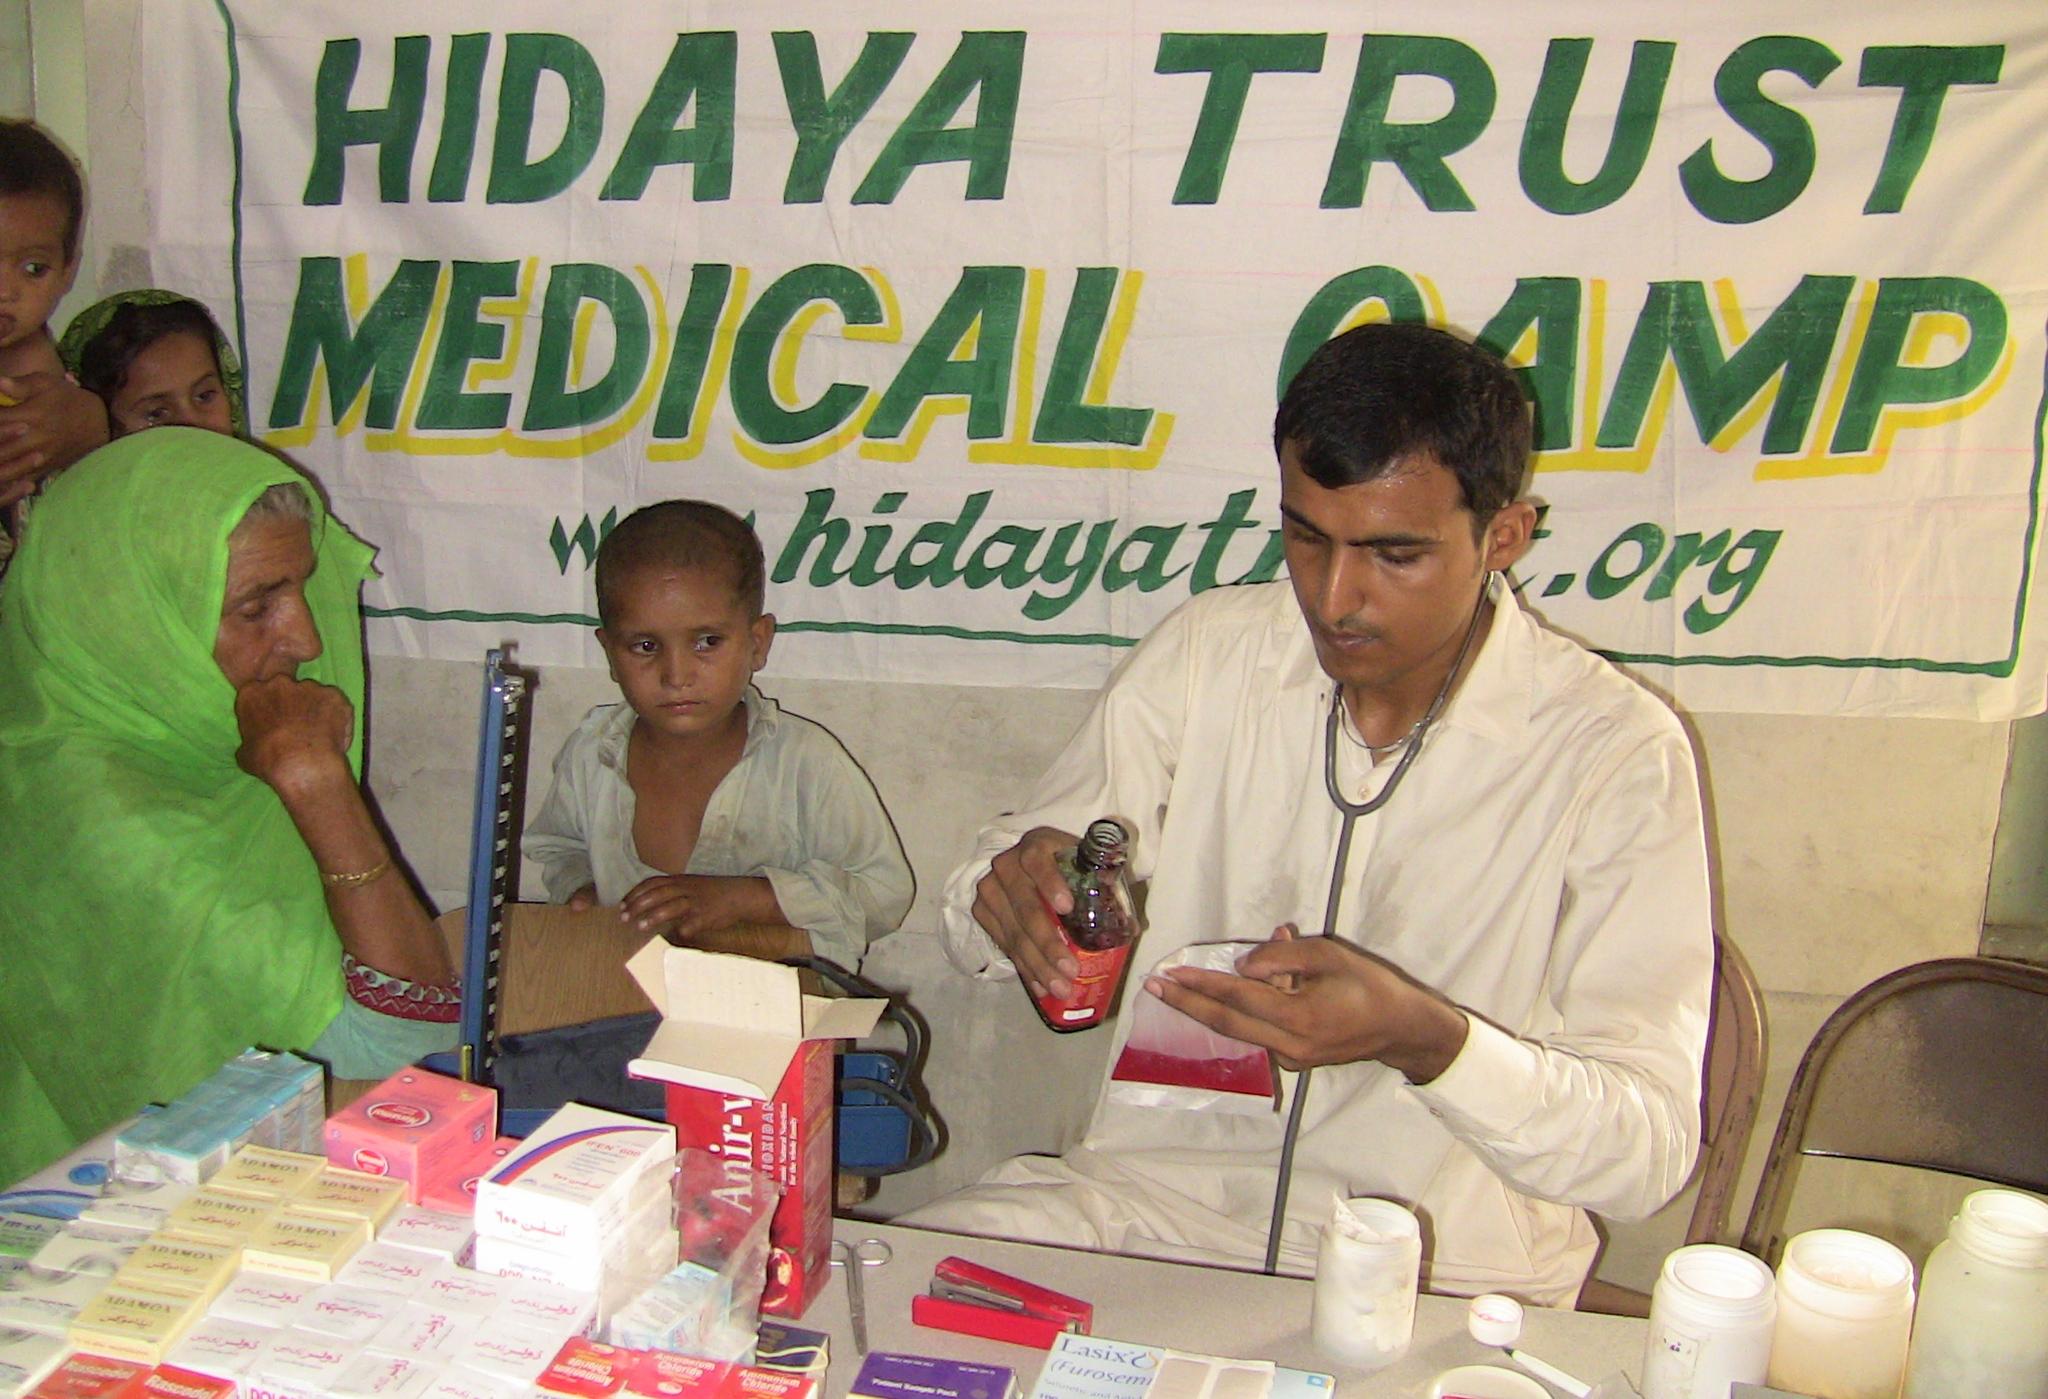 20110716_Sldo_Hcp_Aaqureshi_Bdsanjrani_Sind_Shp_Villrahimabad_Balochform_Medicalcamp_130